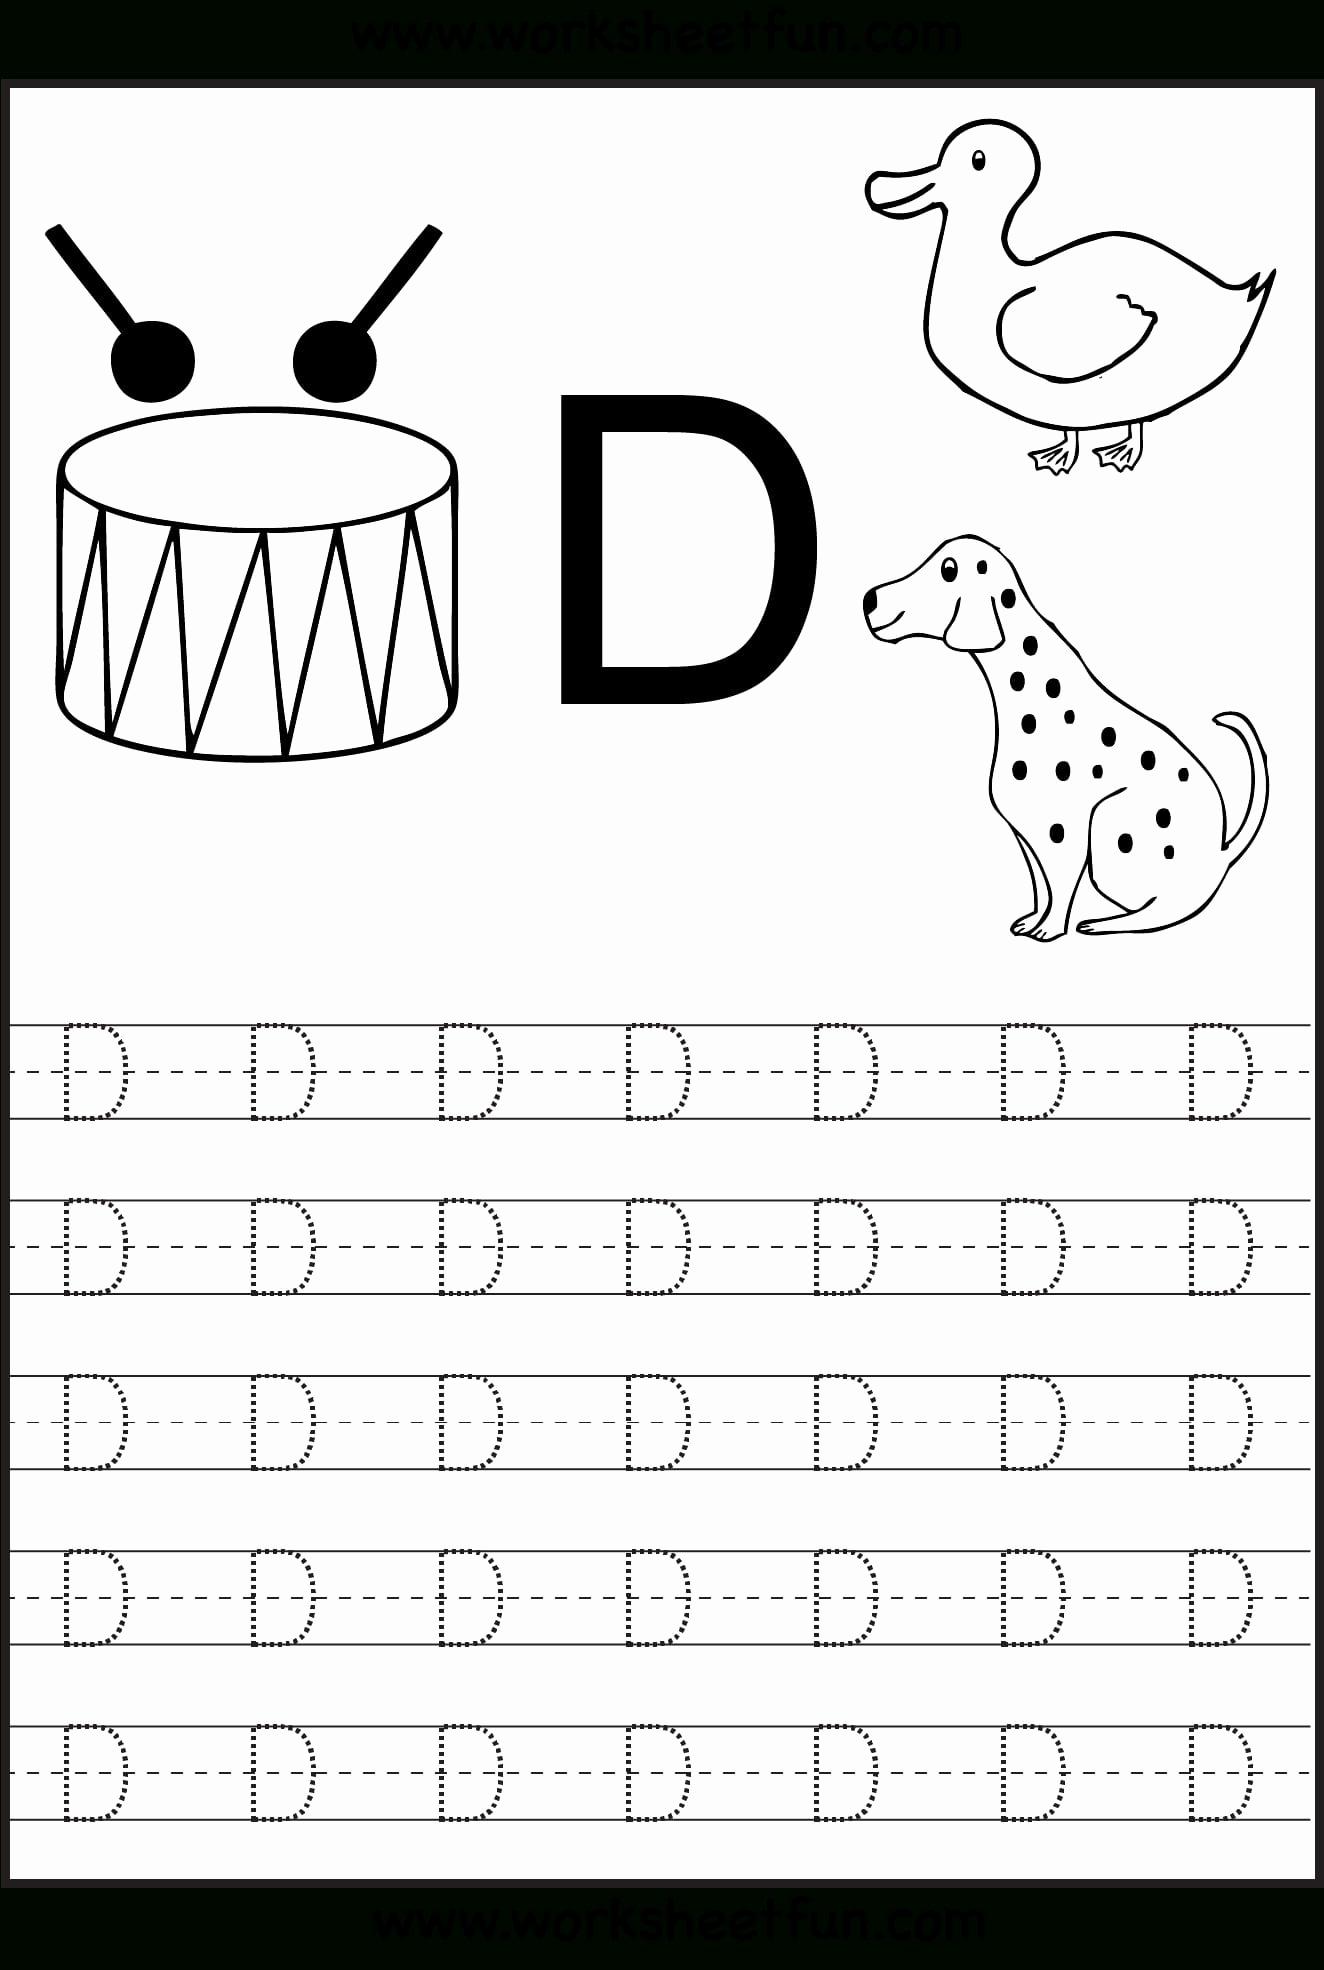 Alphabet Trace Worksheet Fresh Alphabet Worksheets Preschool Tracing Printable Coloring